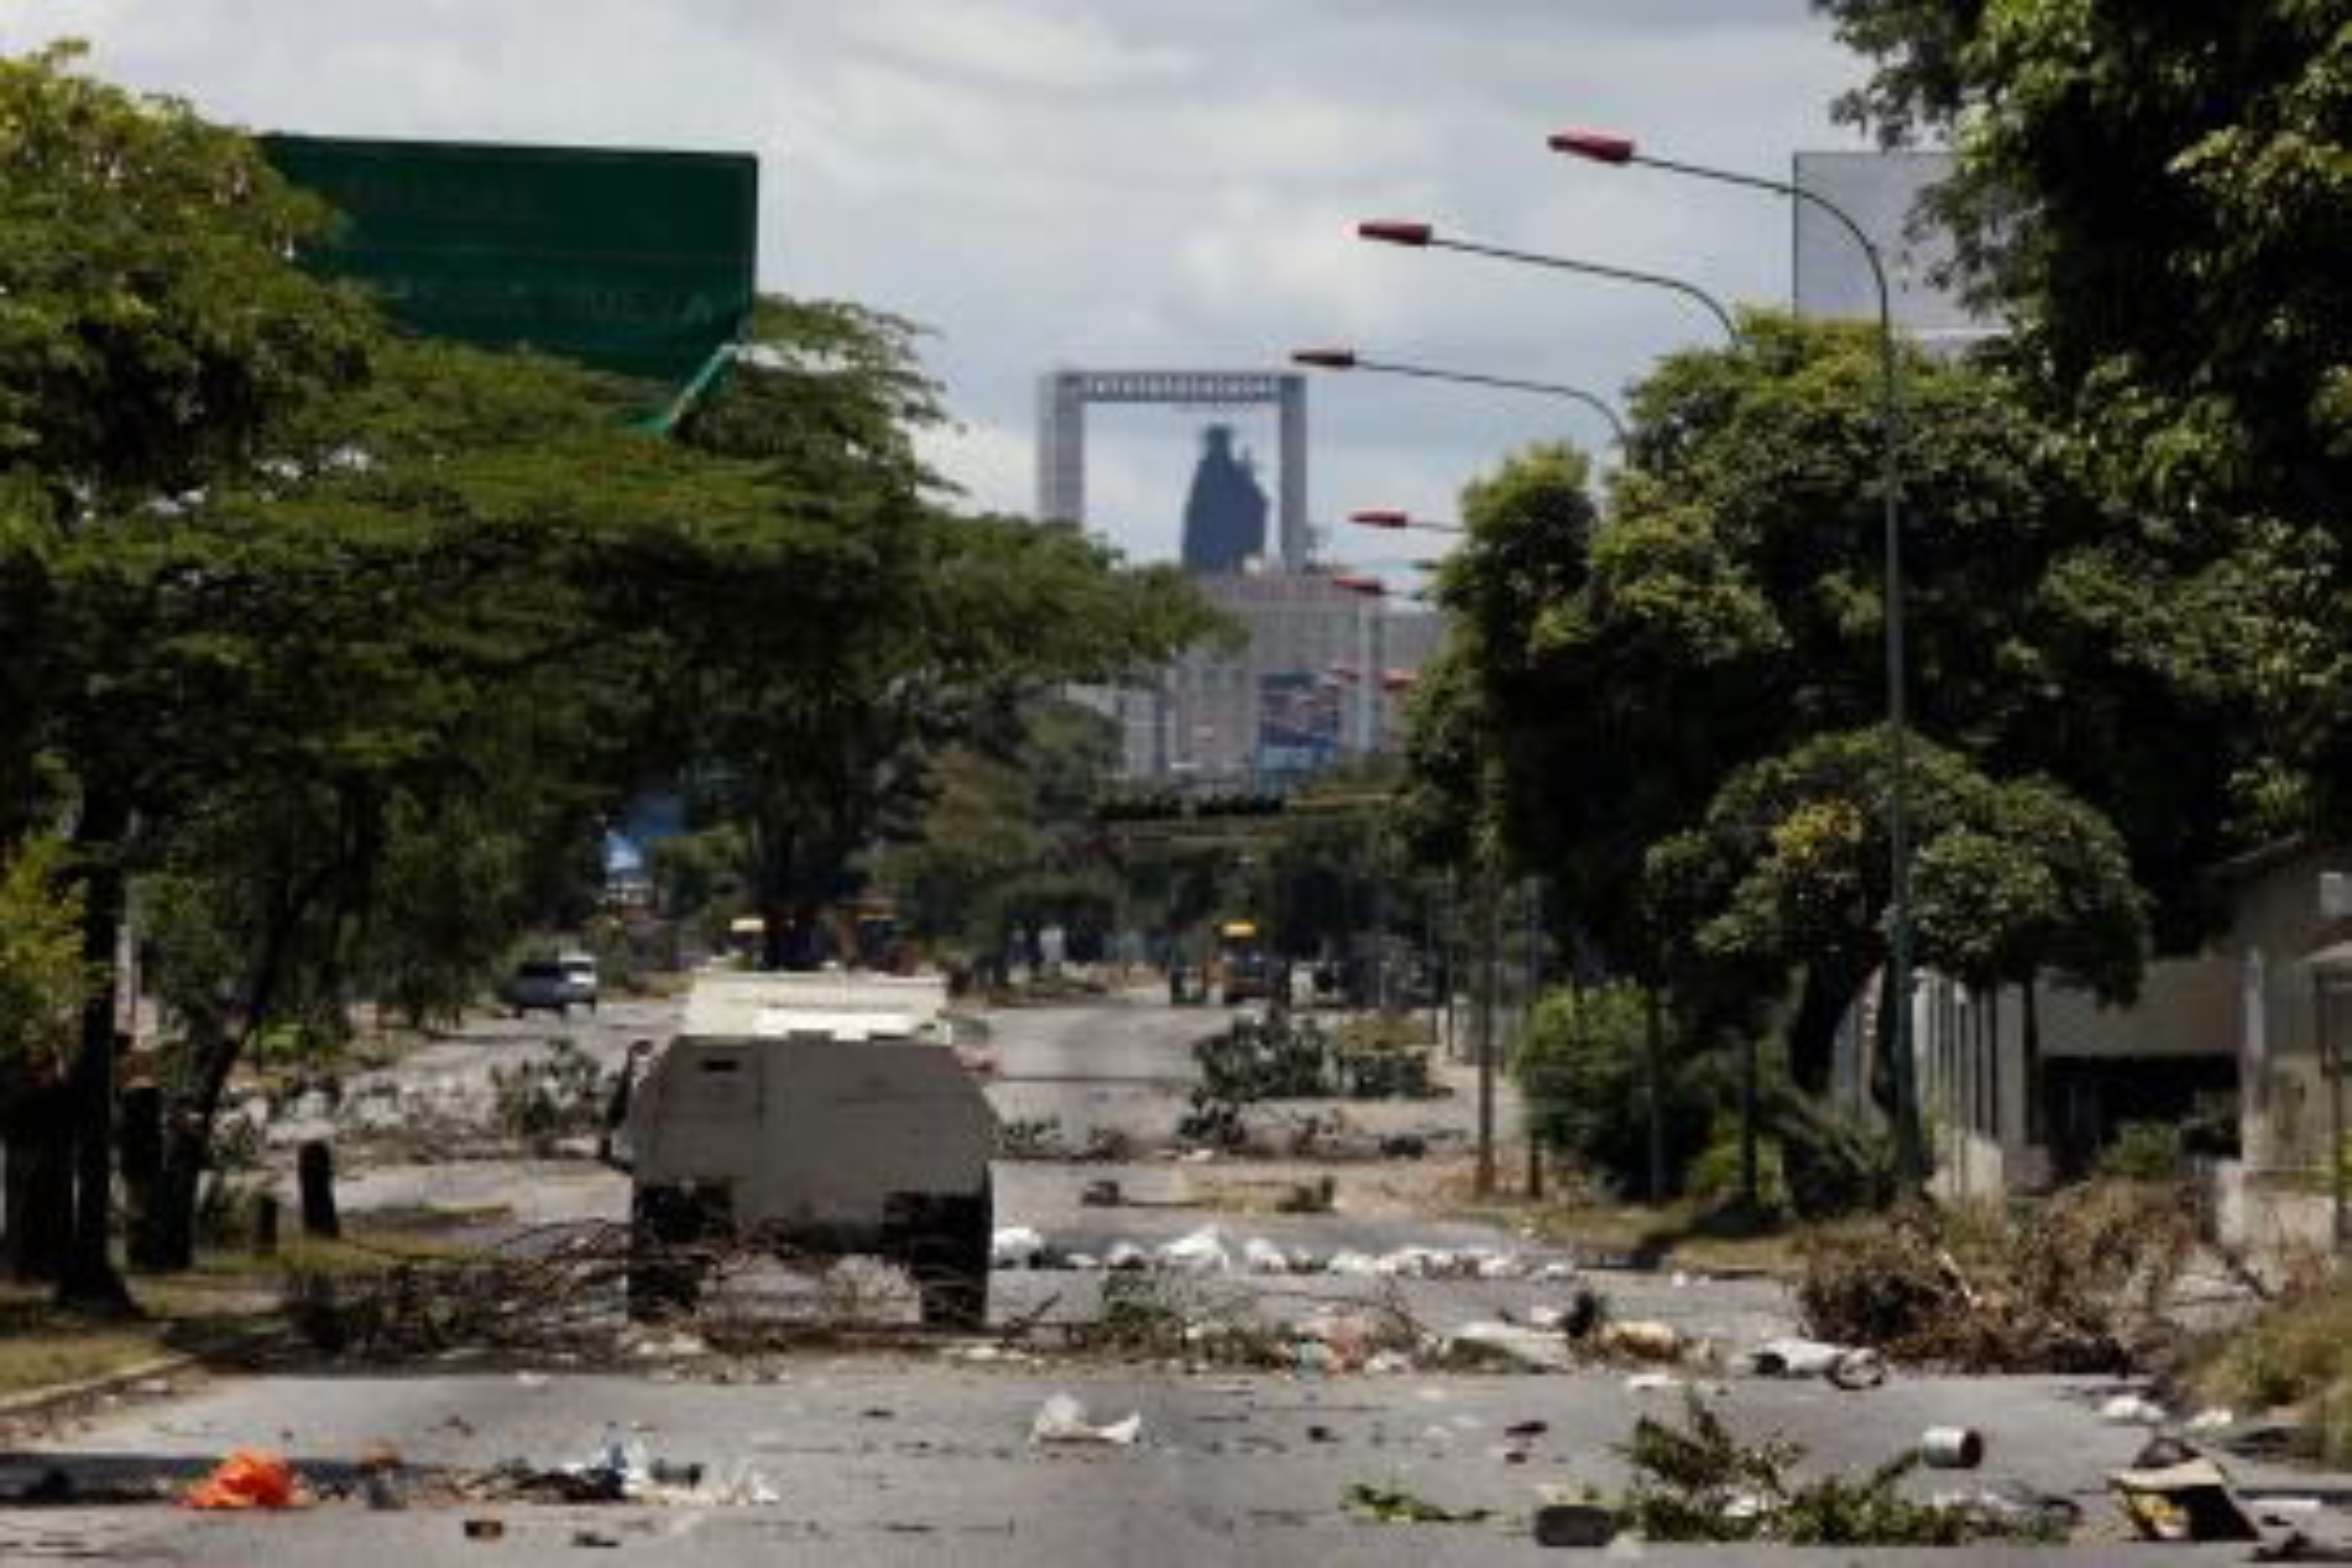 A Bolivarian National Guard vehicle drives down a barren street during a clash between opposition protesters and the Bolivarian National Guard